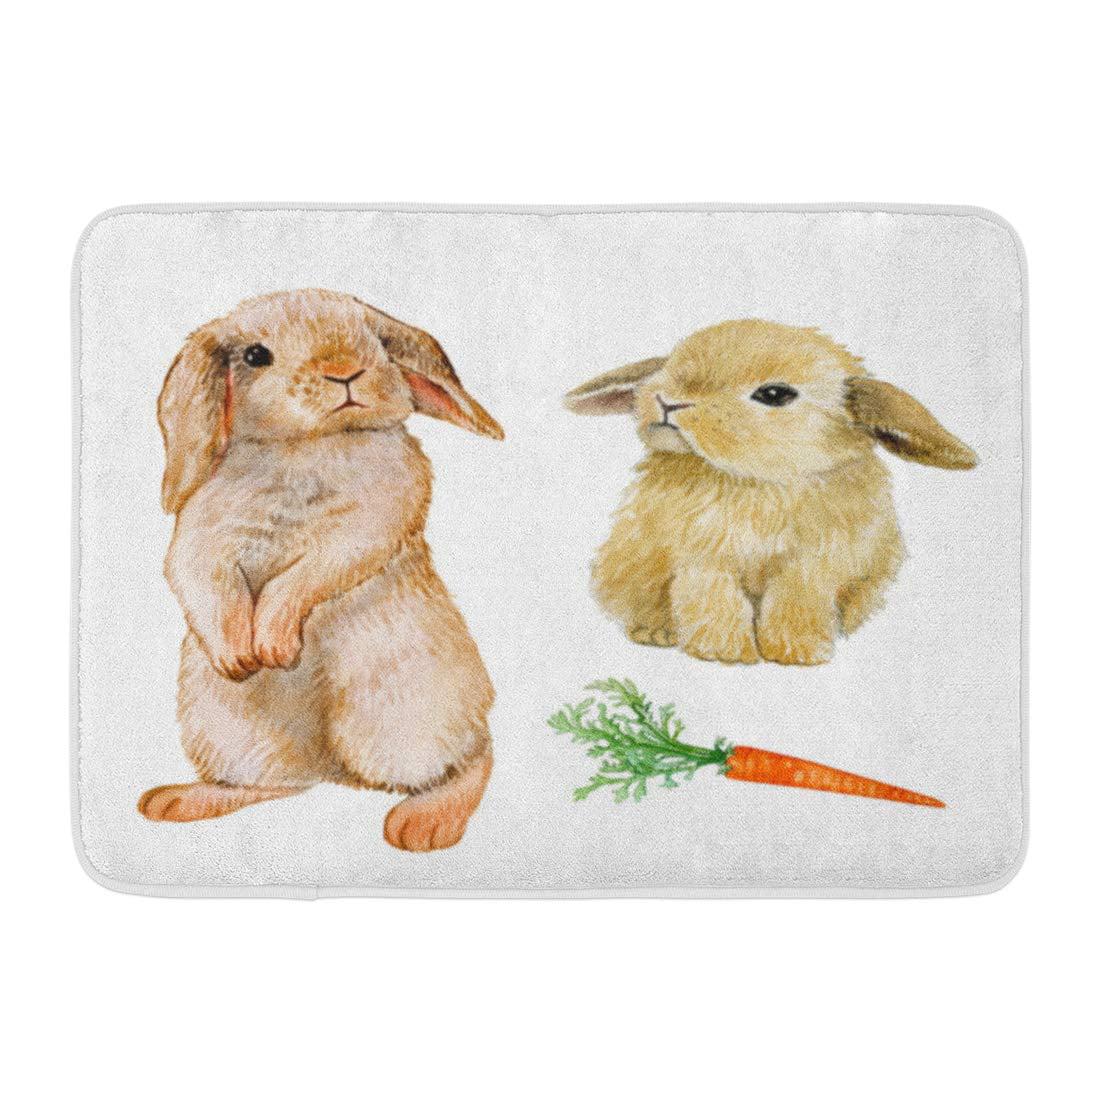 Godpok Cute White Bunny Rabbit With Carrot Watercolor Draw Animal Easter Vintage Rug Doormat Bath Mat 23 6x15 7 Inch Walmart Com Walmart Com